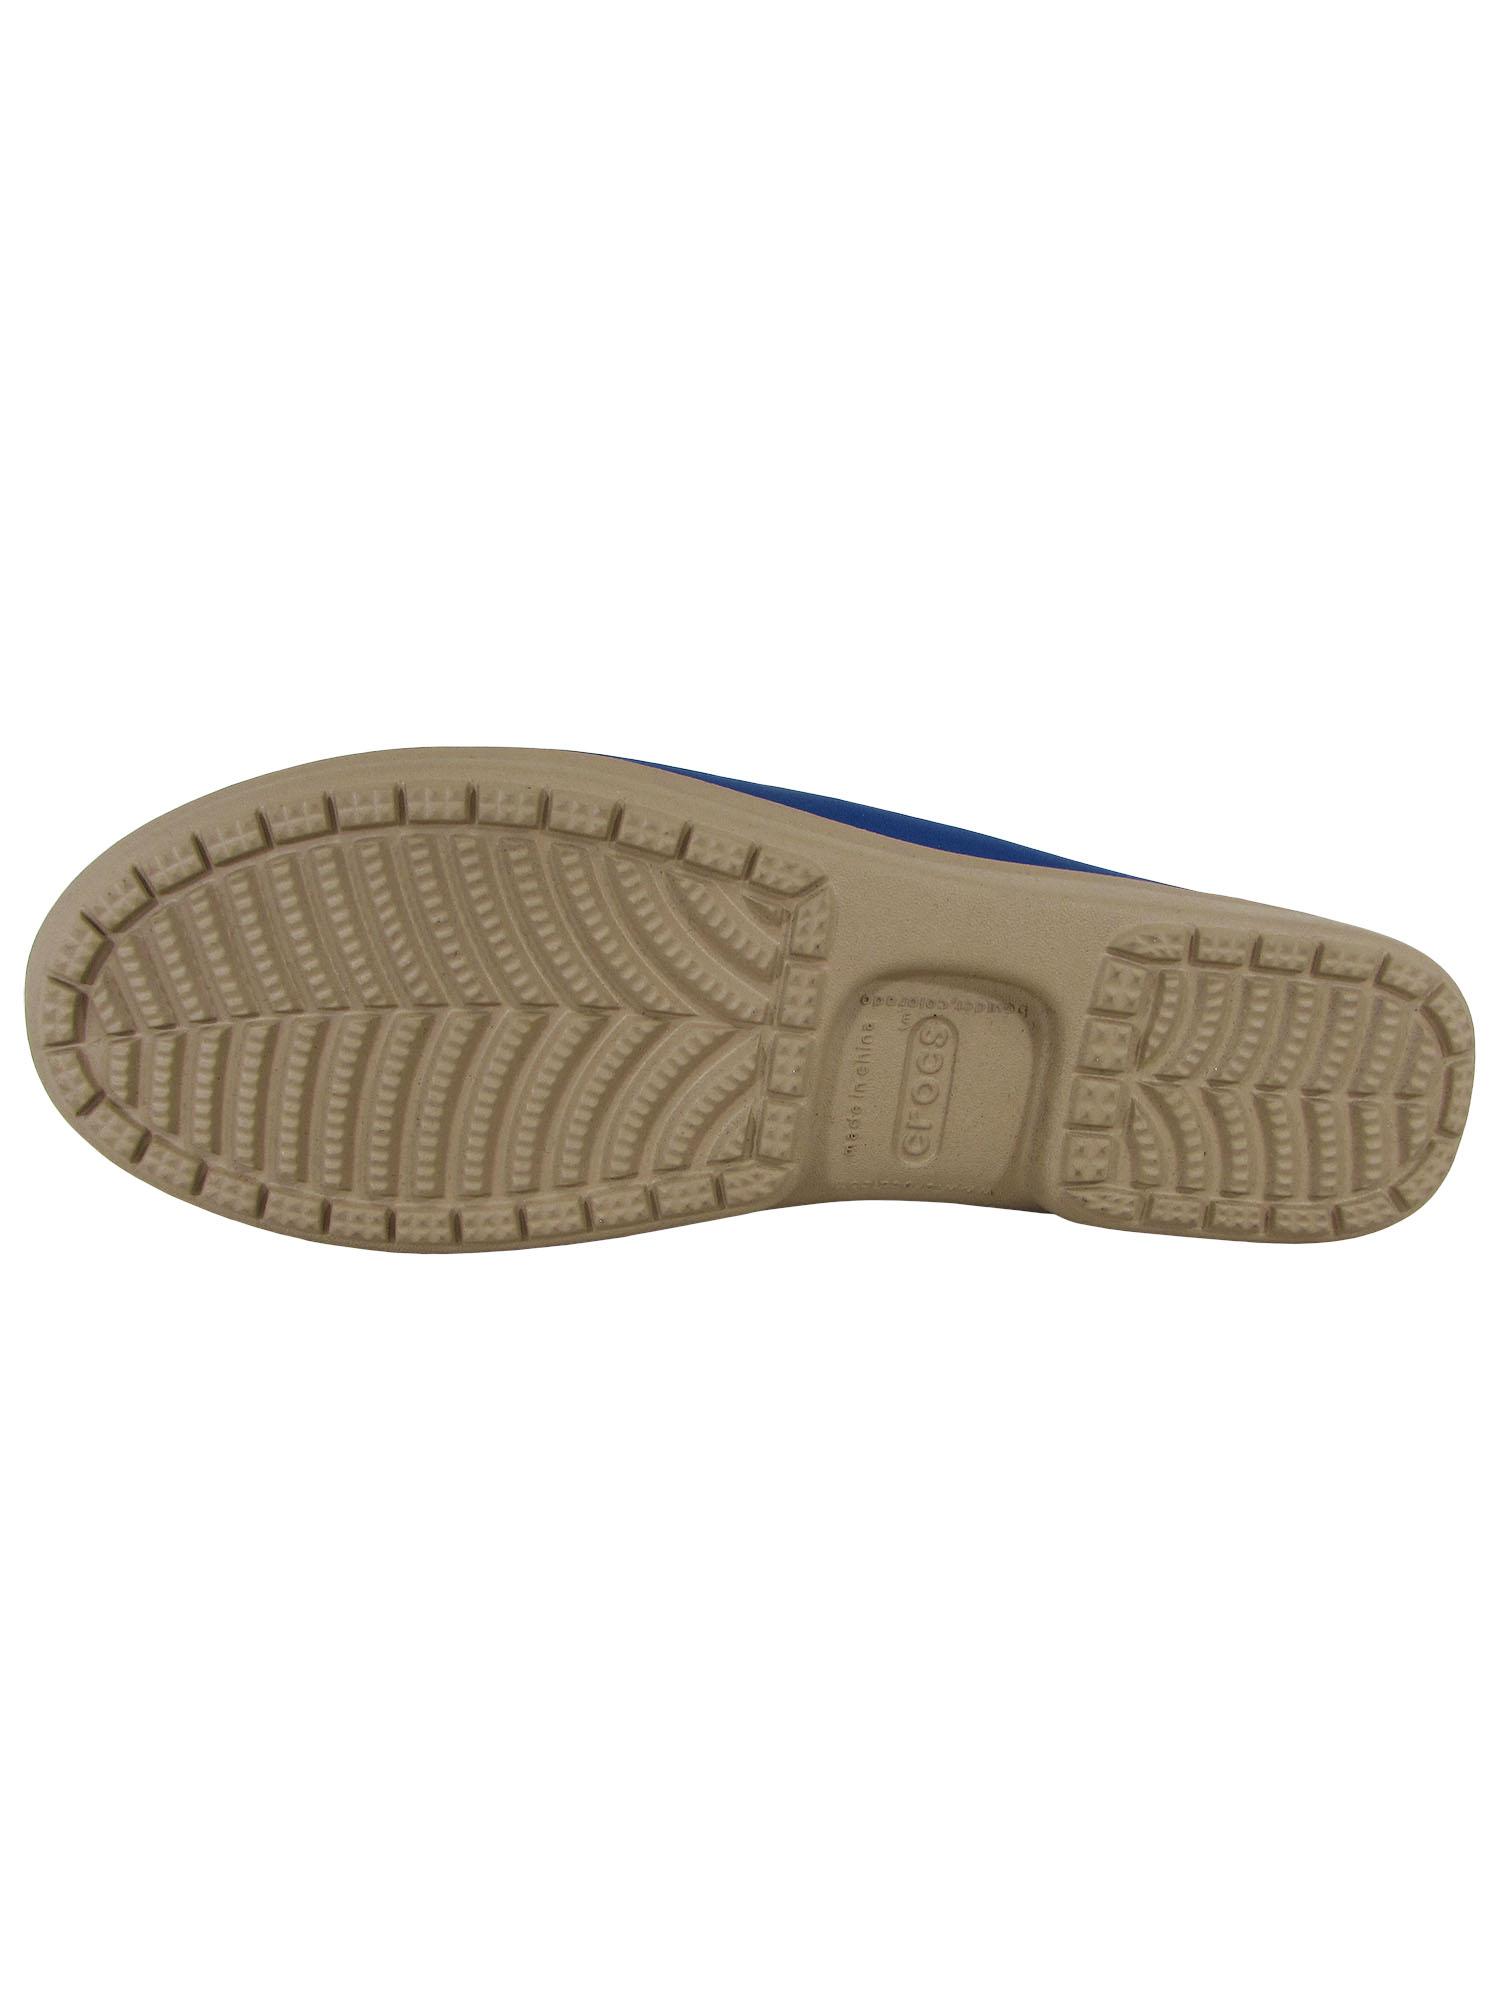 Crocs-Womens-Wrap-ColorLite-Loafer-Shoes thumbnail 3